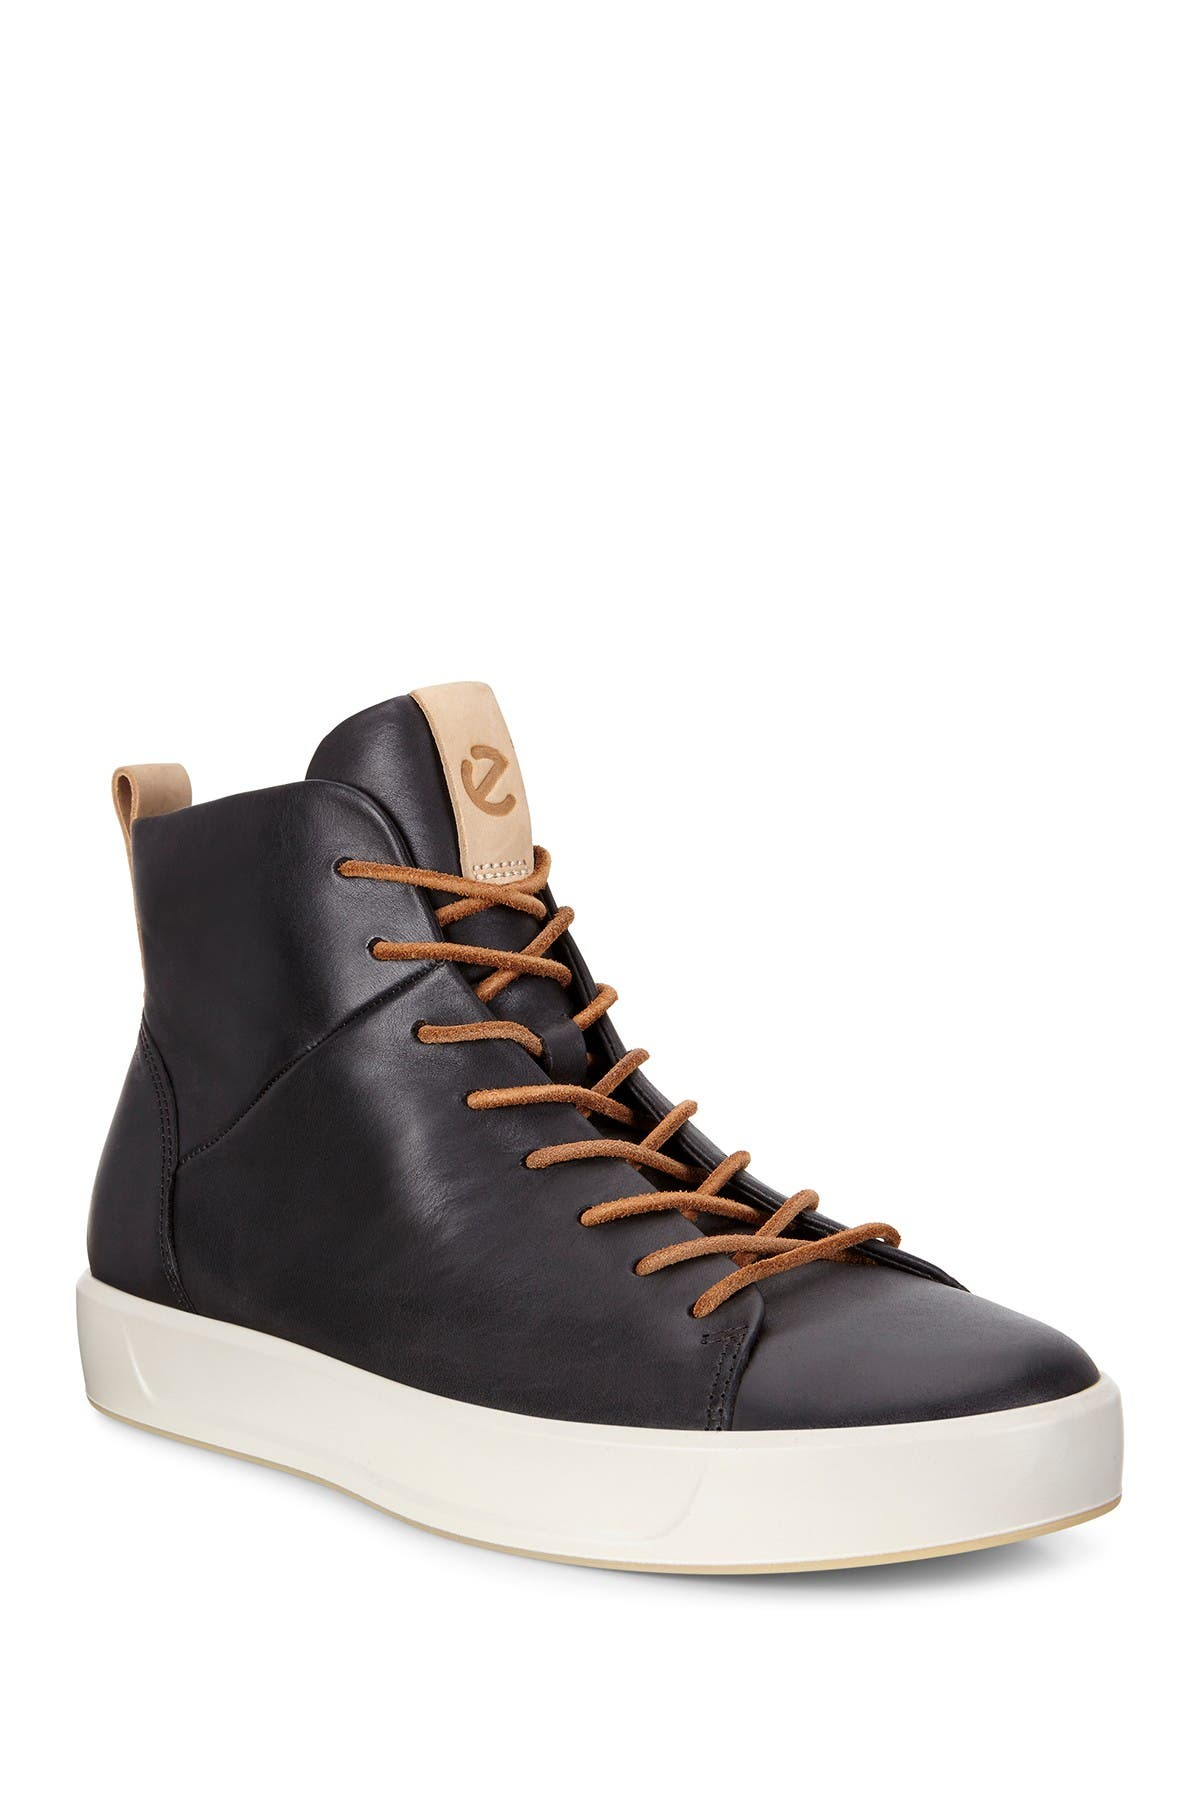 ECCO | Soft 8 LX High Top Sneaker